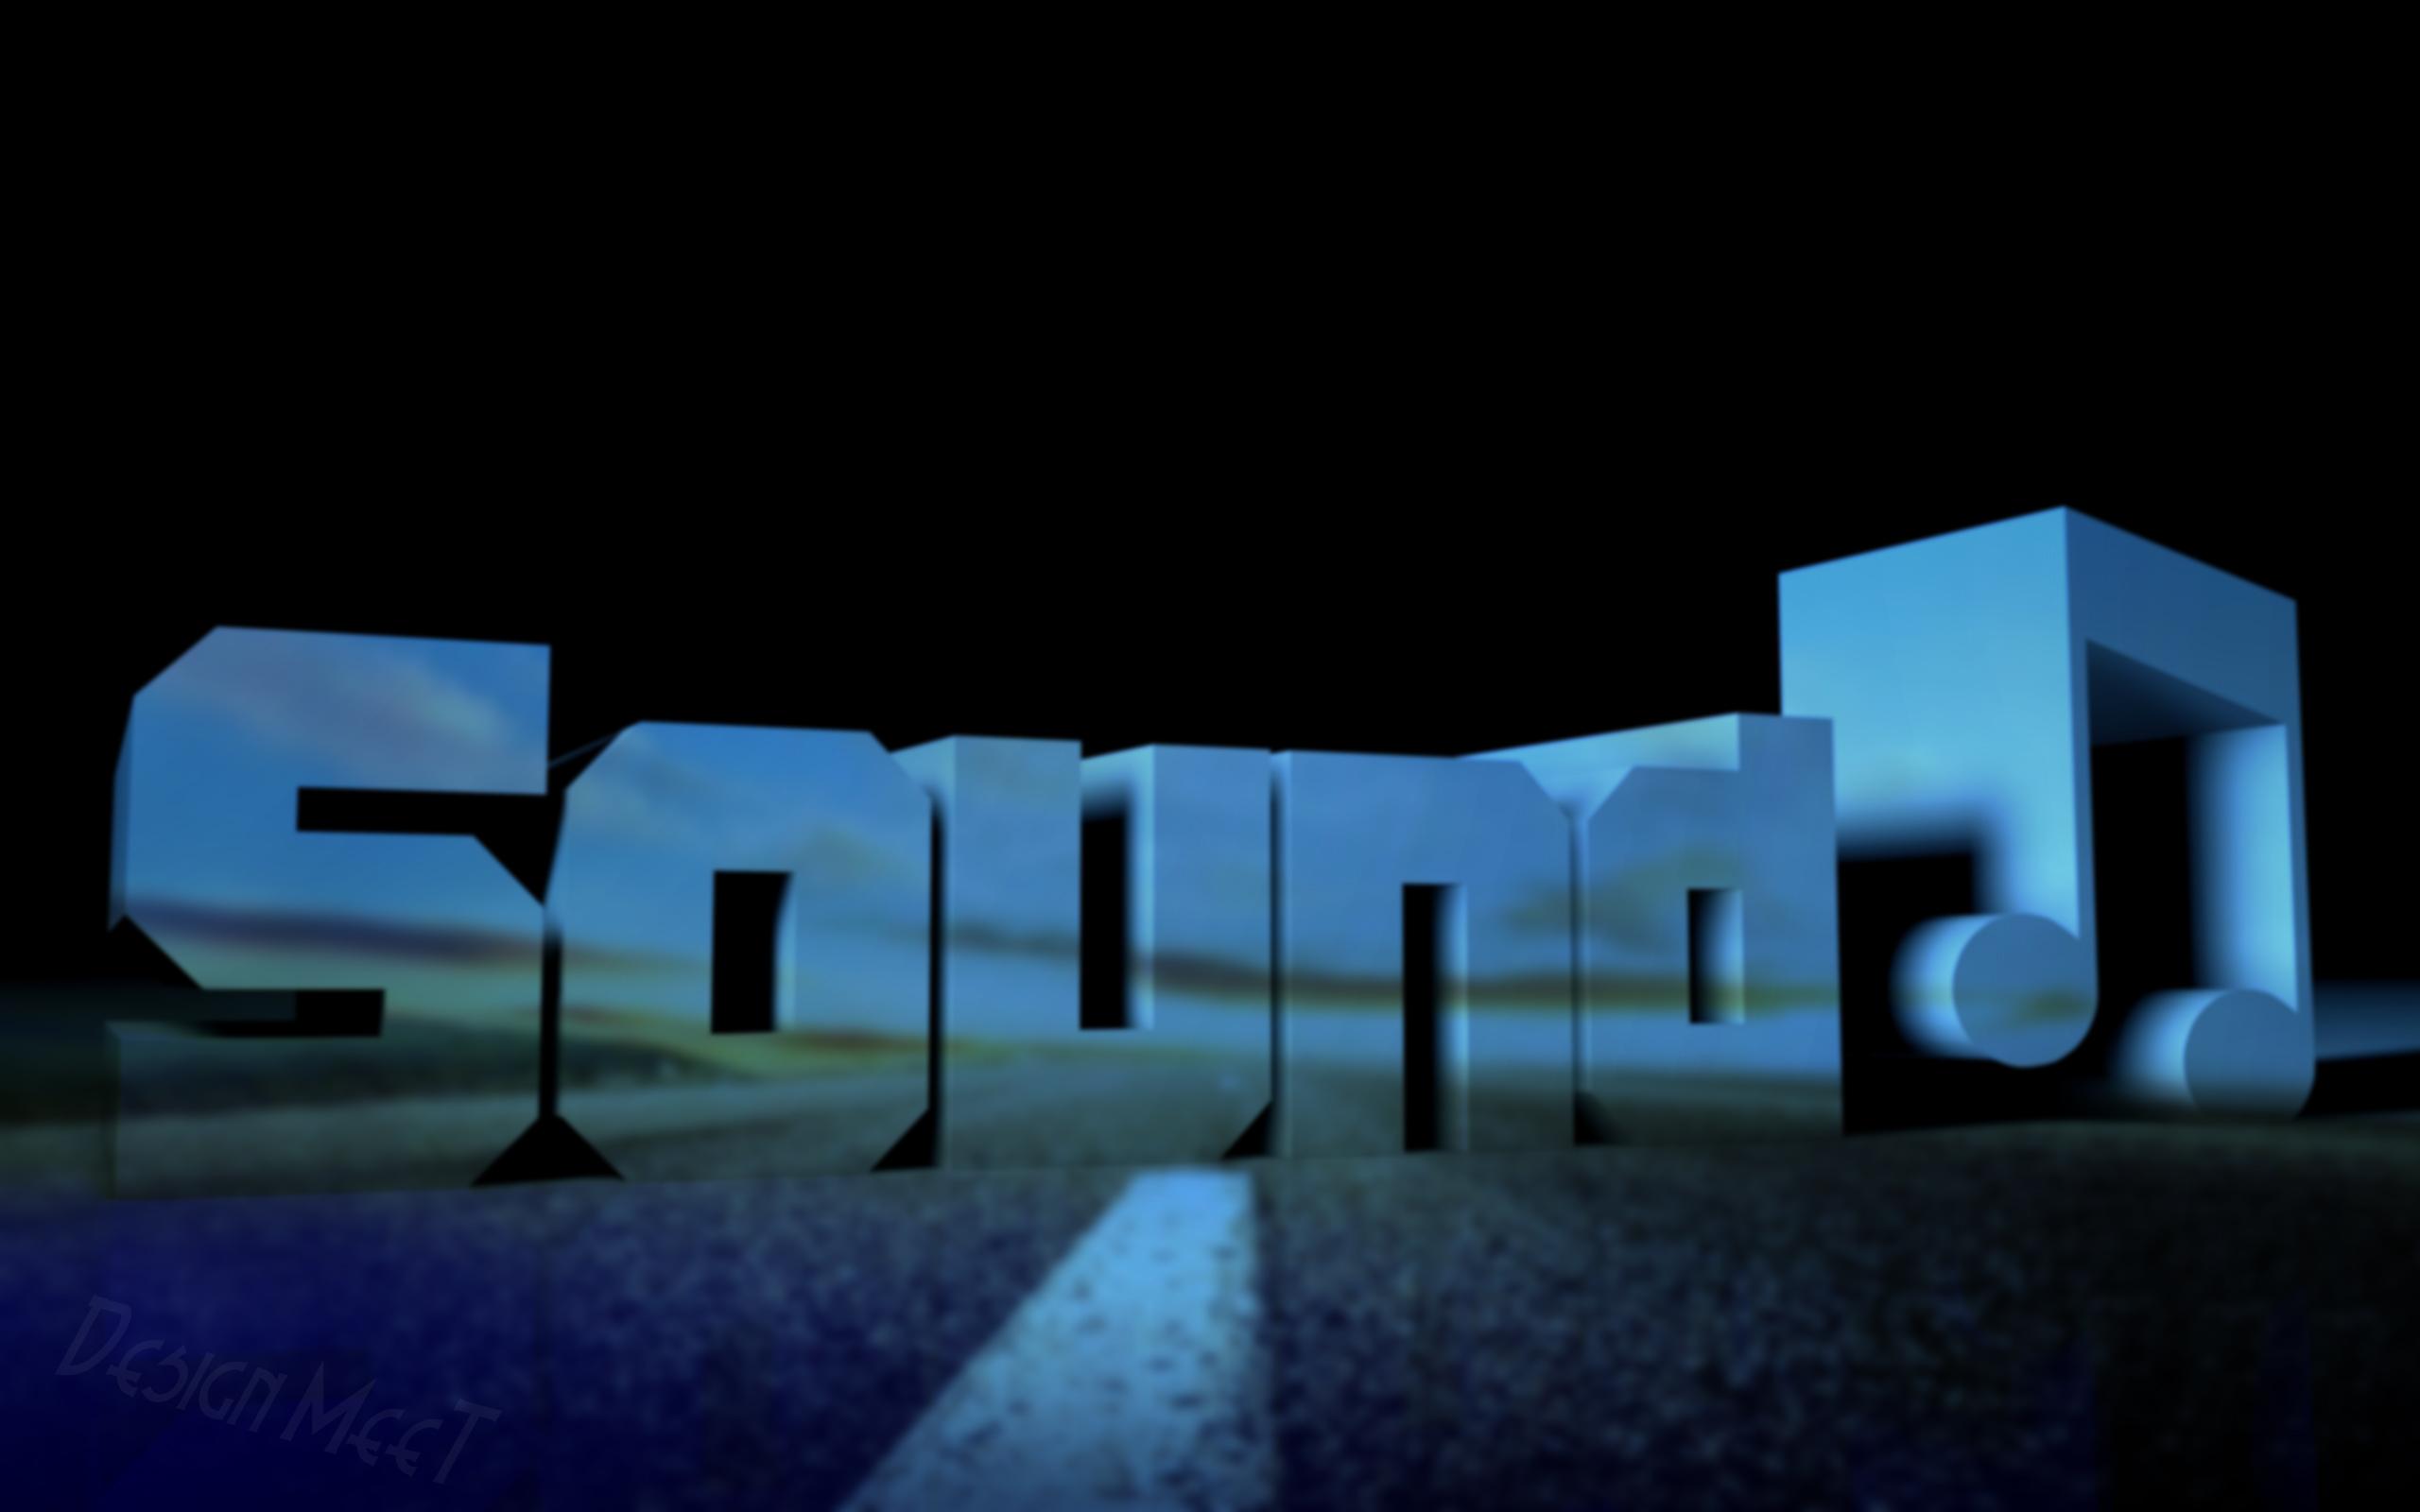 2560x1600 Sound Blue desktop PC and Mac wallpaper 2560x1600